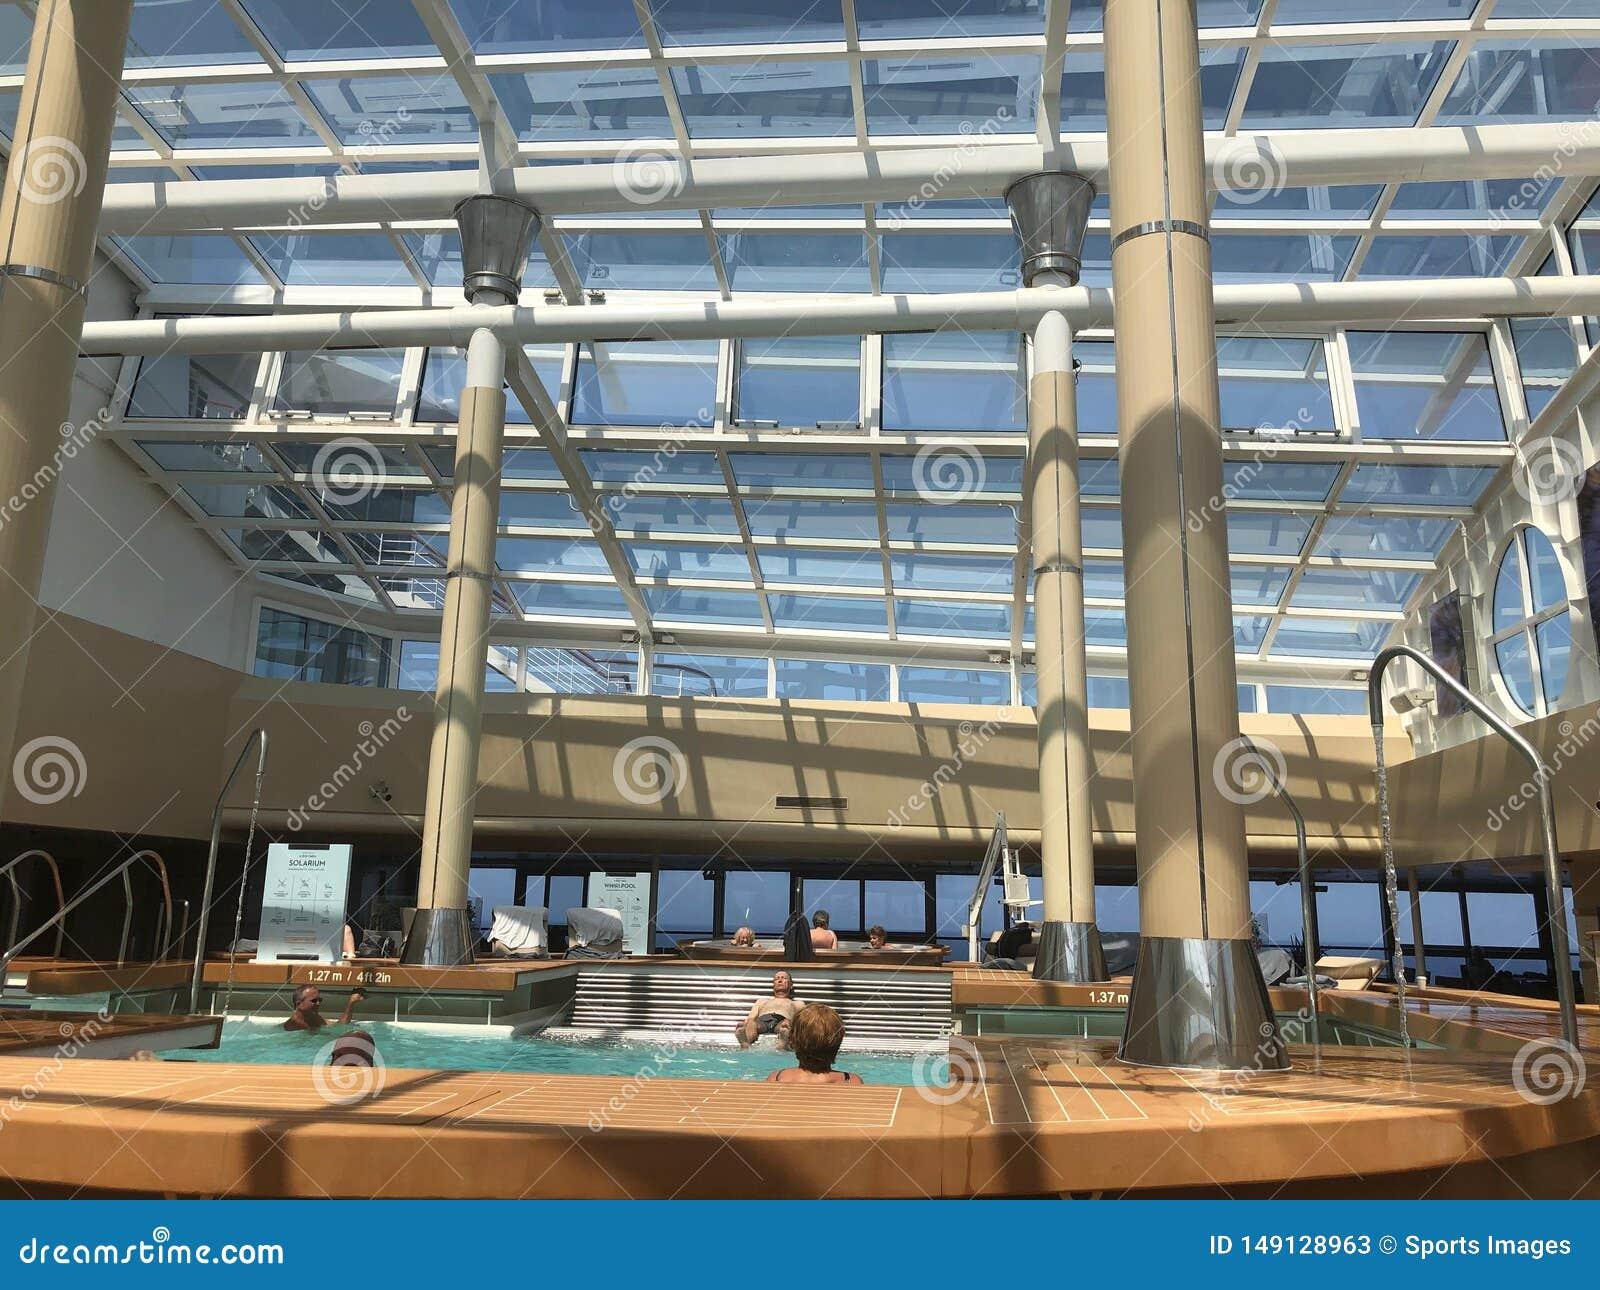 The Solarium, indoor pool onboard cruise ship.